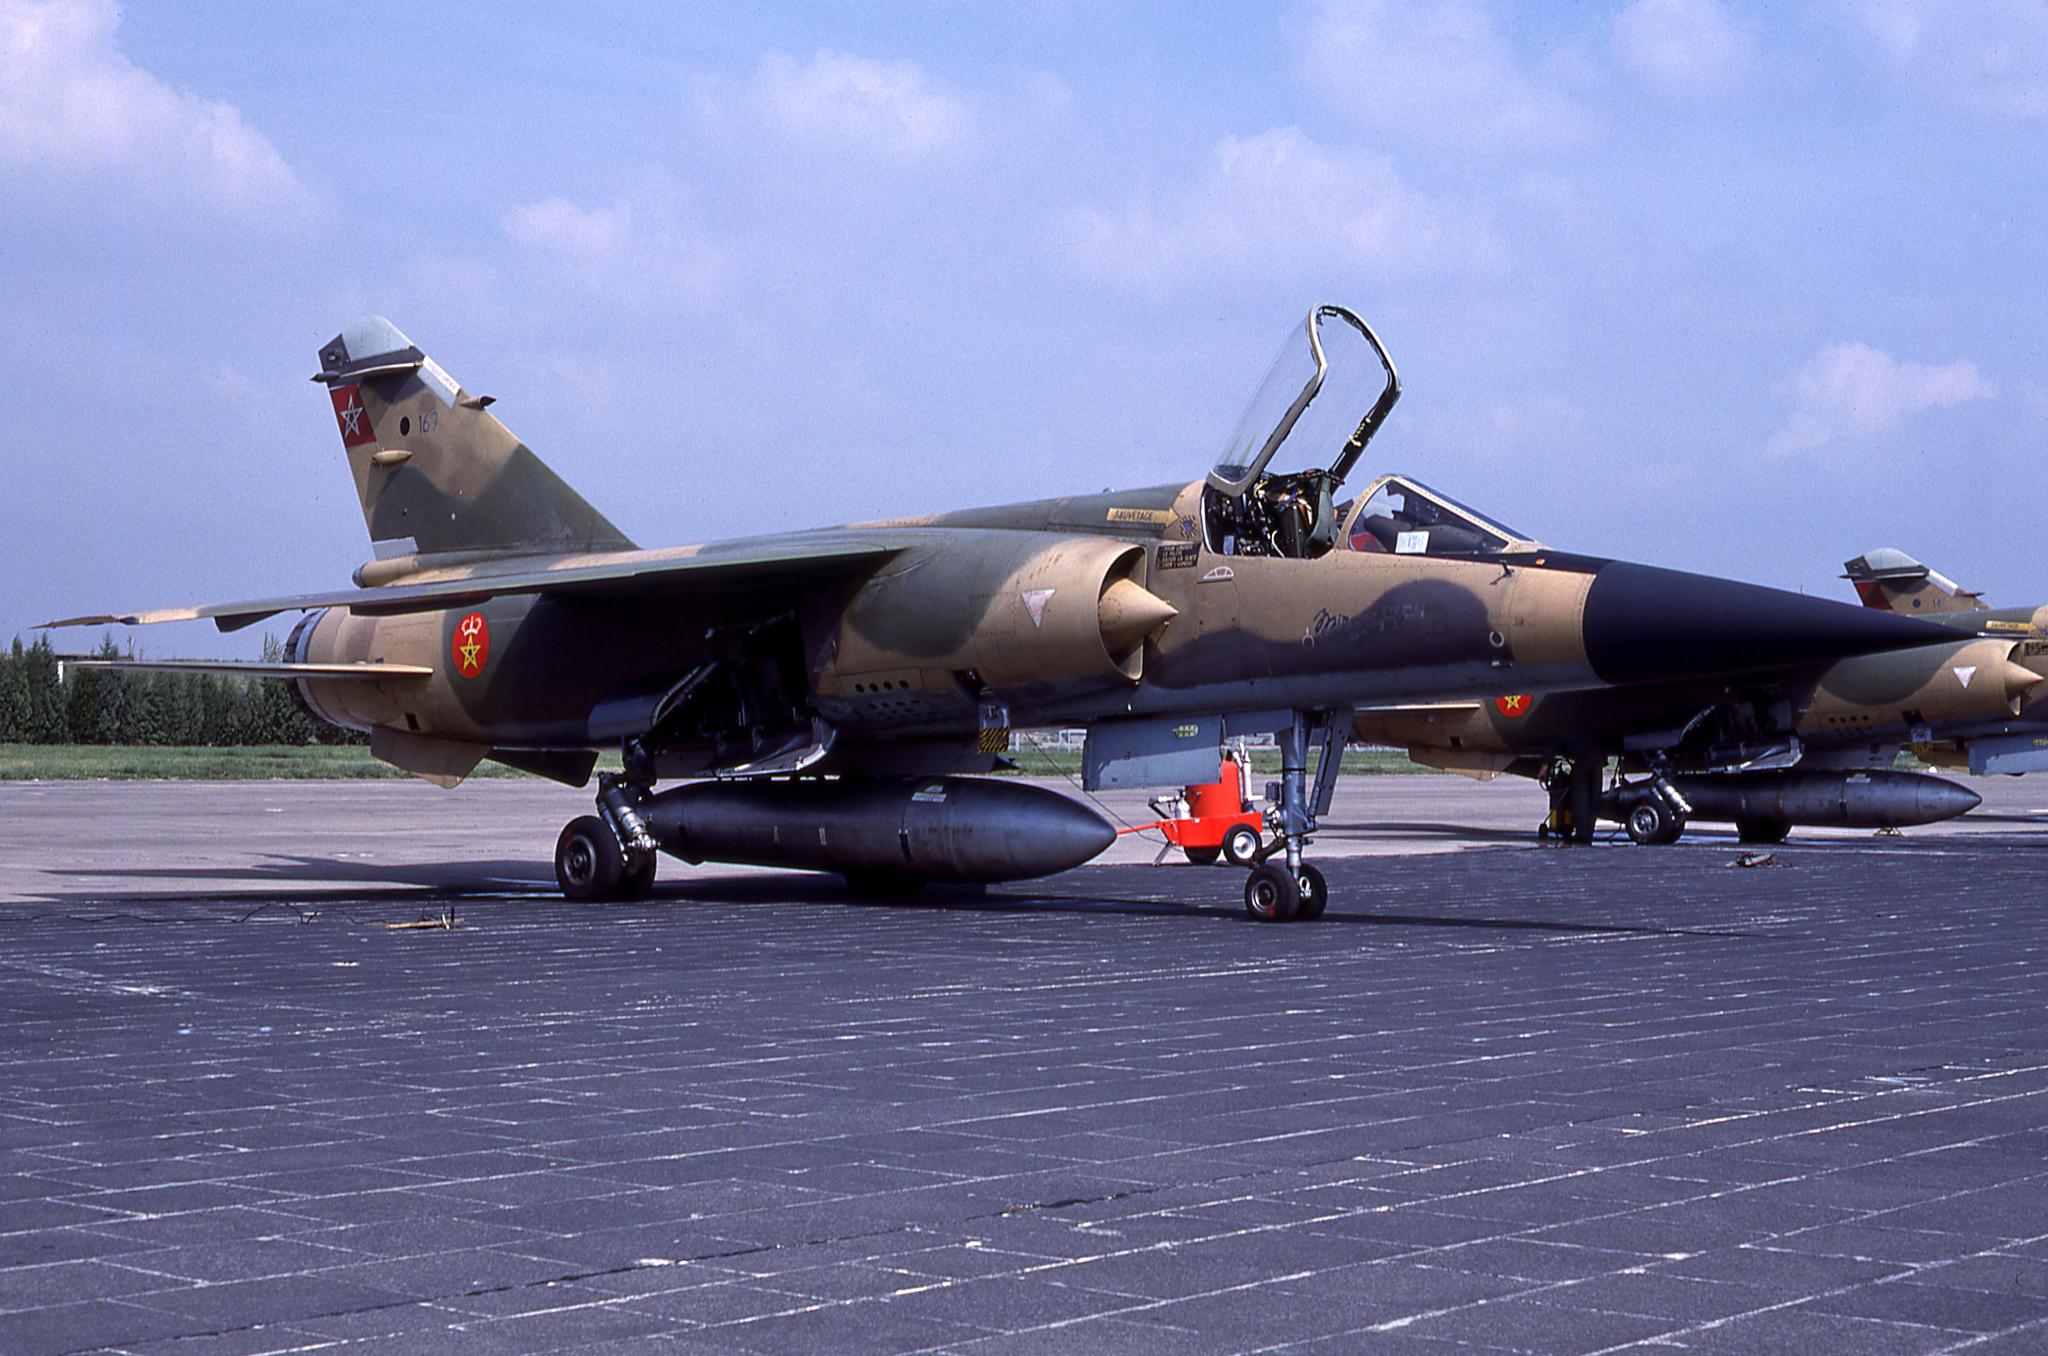 FRA: Photos Mirage F1 - Page 15 45428707284_6f6dd7ba3d_o